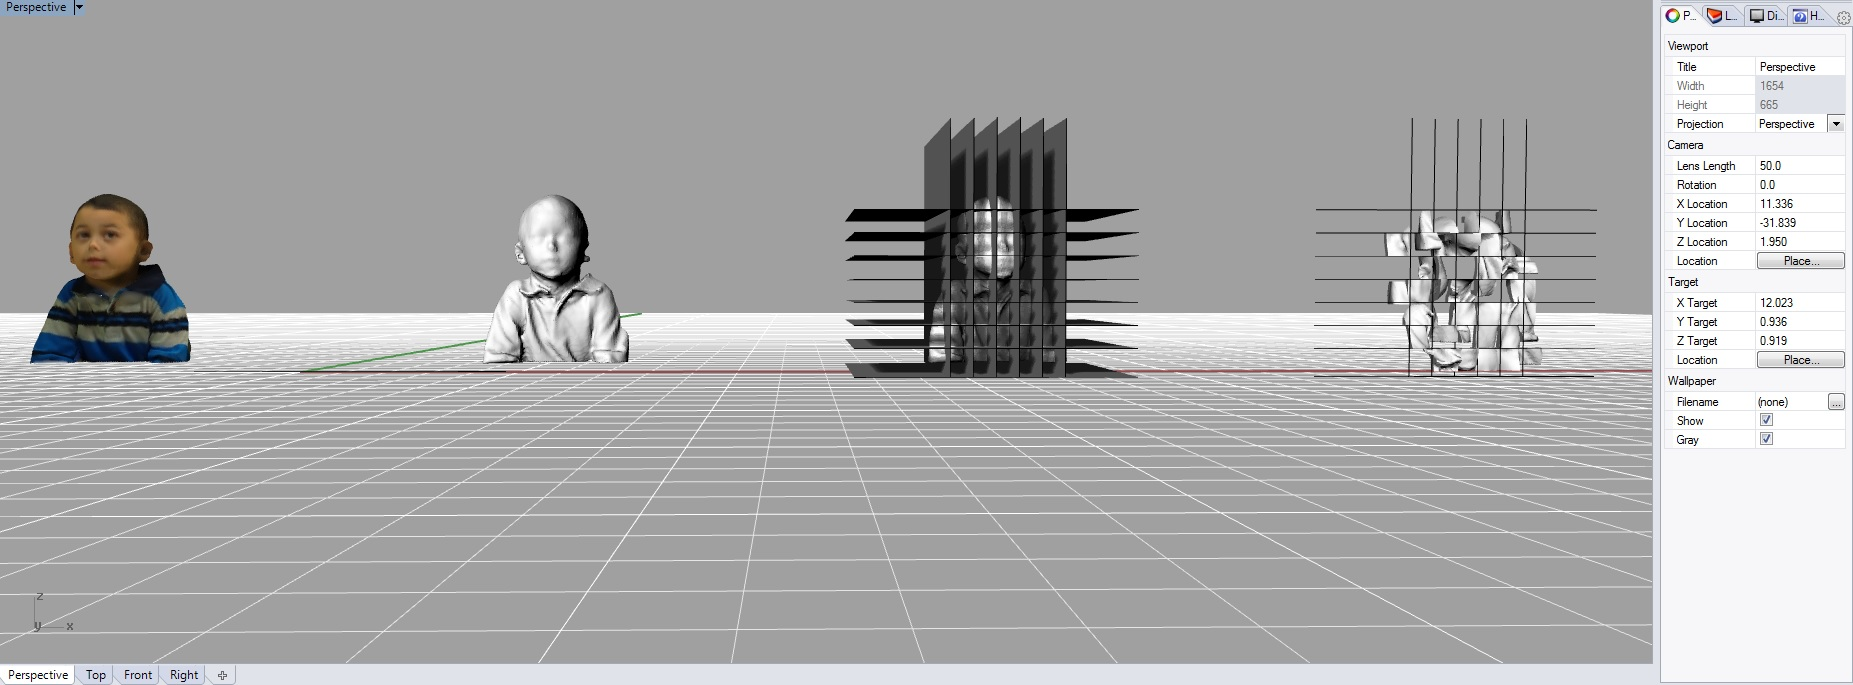 pixel dancing_01.jpg